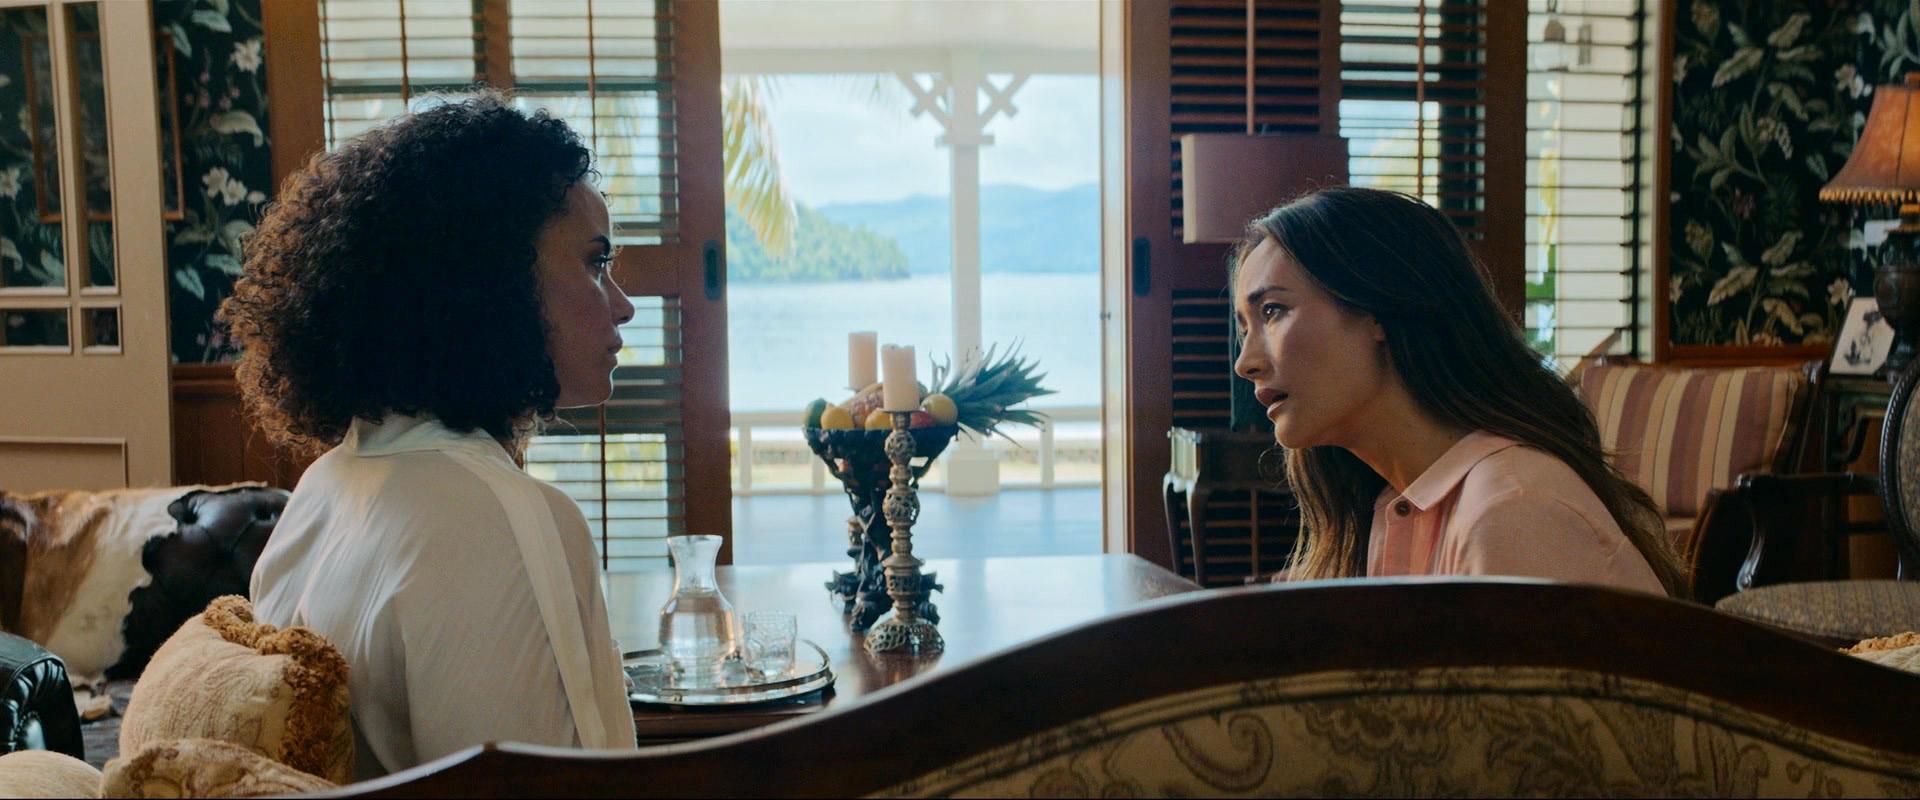 Hayal Adası | Fantasy Island | 2020 | BDRip | XviD | Türkçe Dublaj | 720p - 1080p - m720p - m1080p | BluRay | Dual | TR-EN | Tek Link